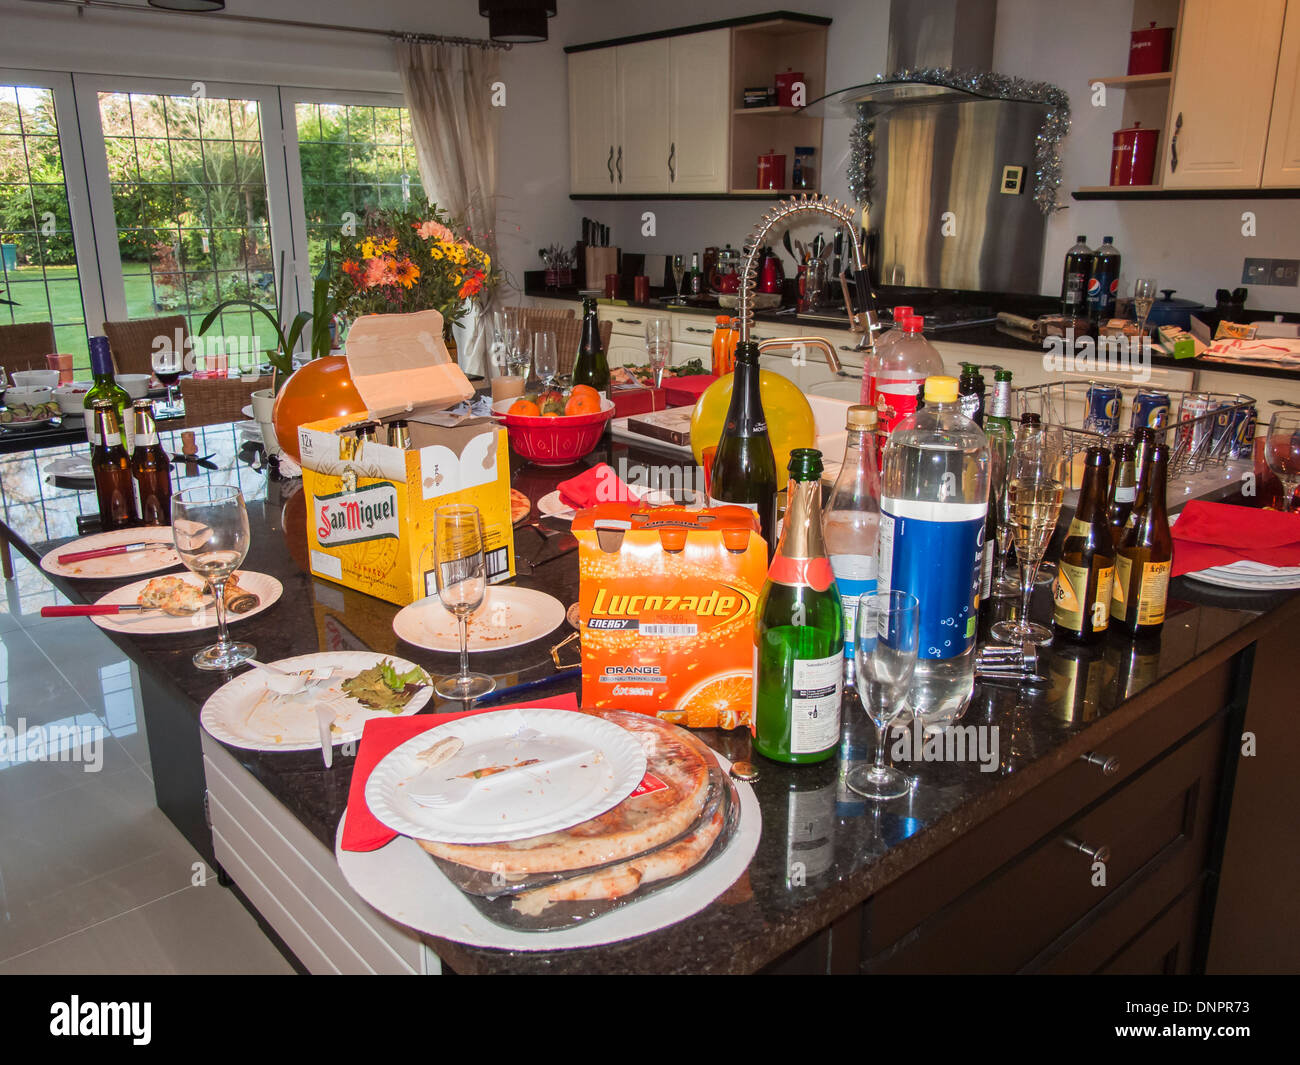 Cucina Disordinata Immagini Cucina Disordinata Fotos Stock Alamy